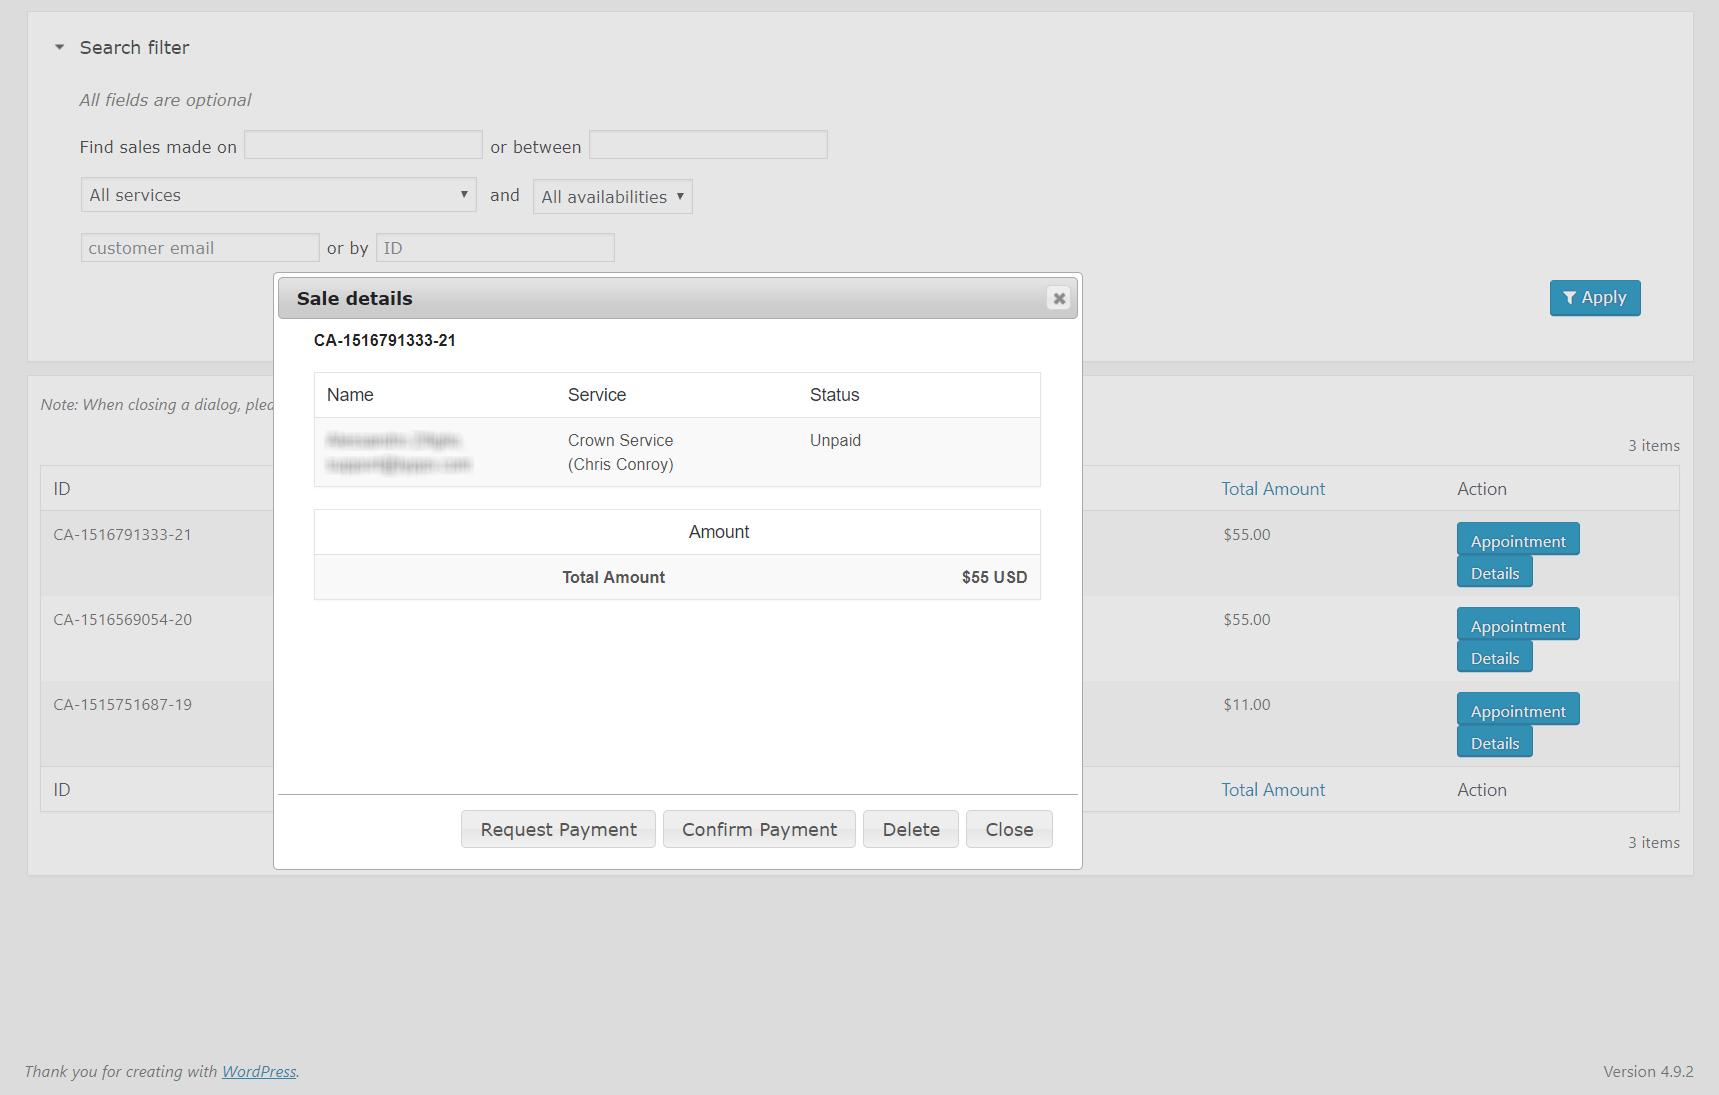 Calendarista Premium WP Appointment Booking Plugin and